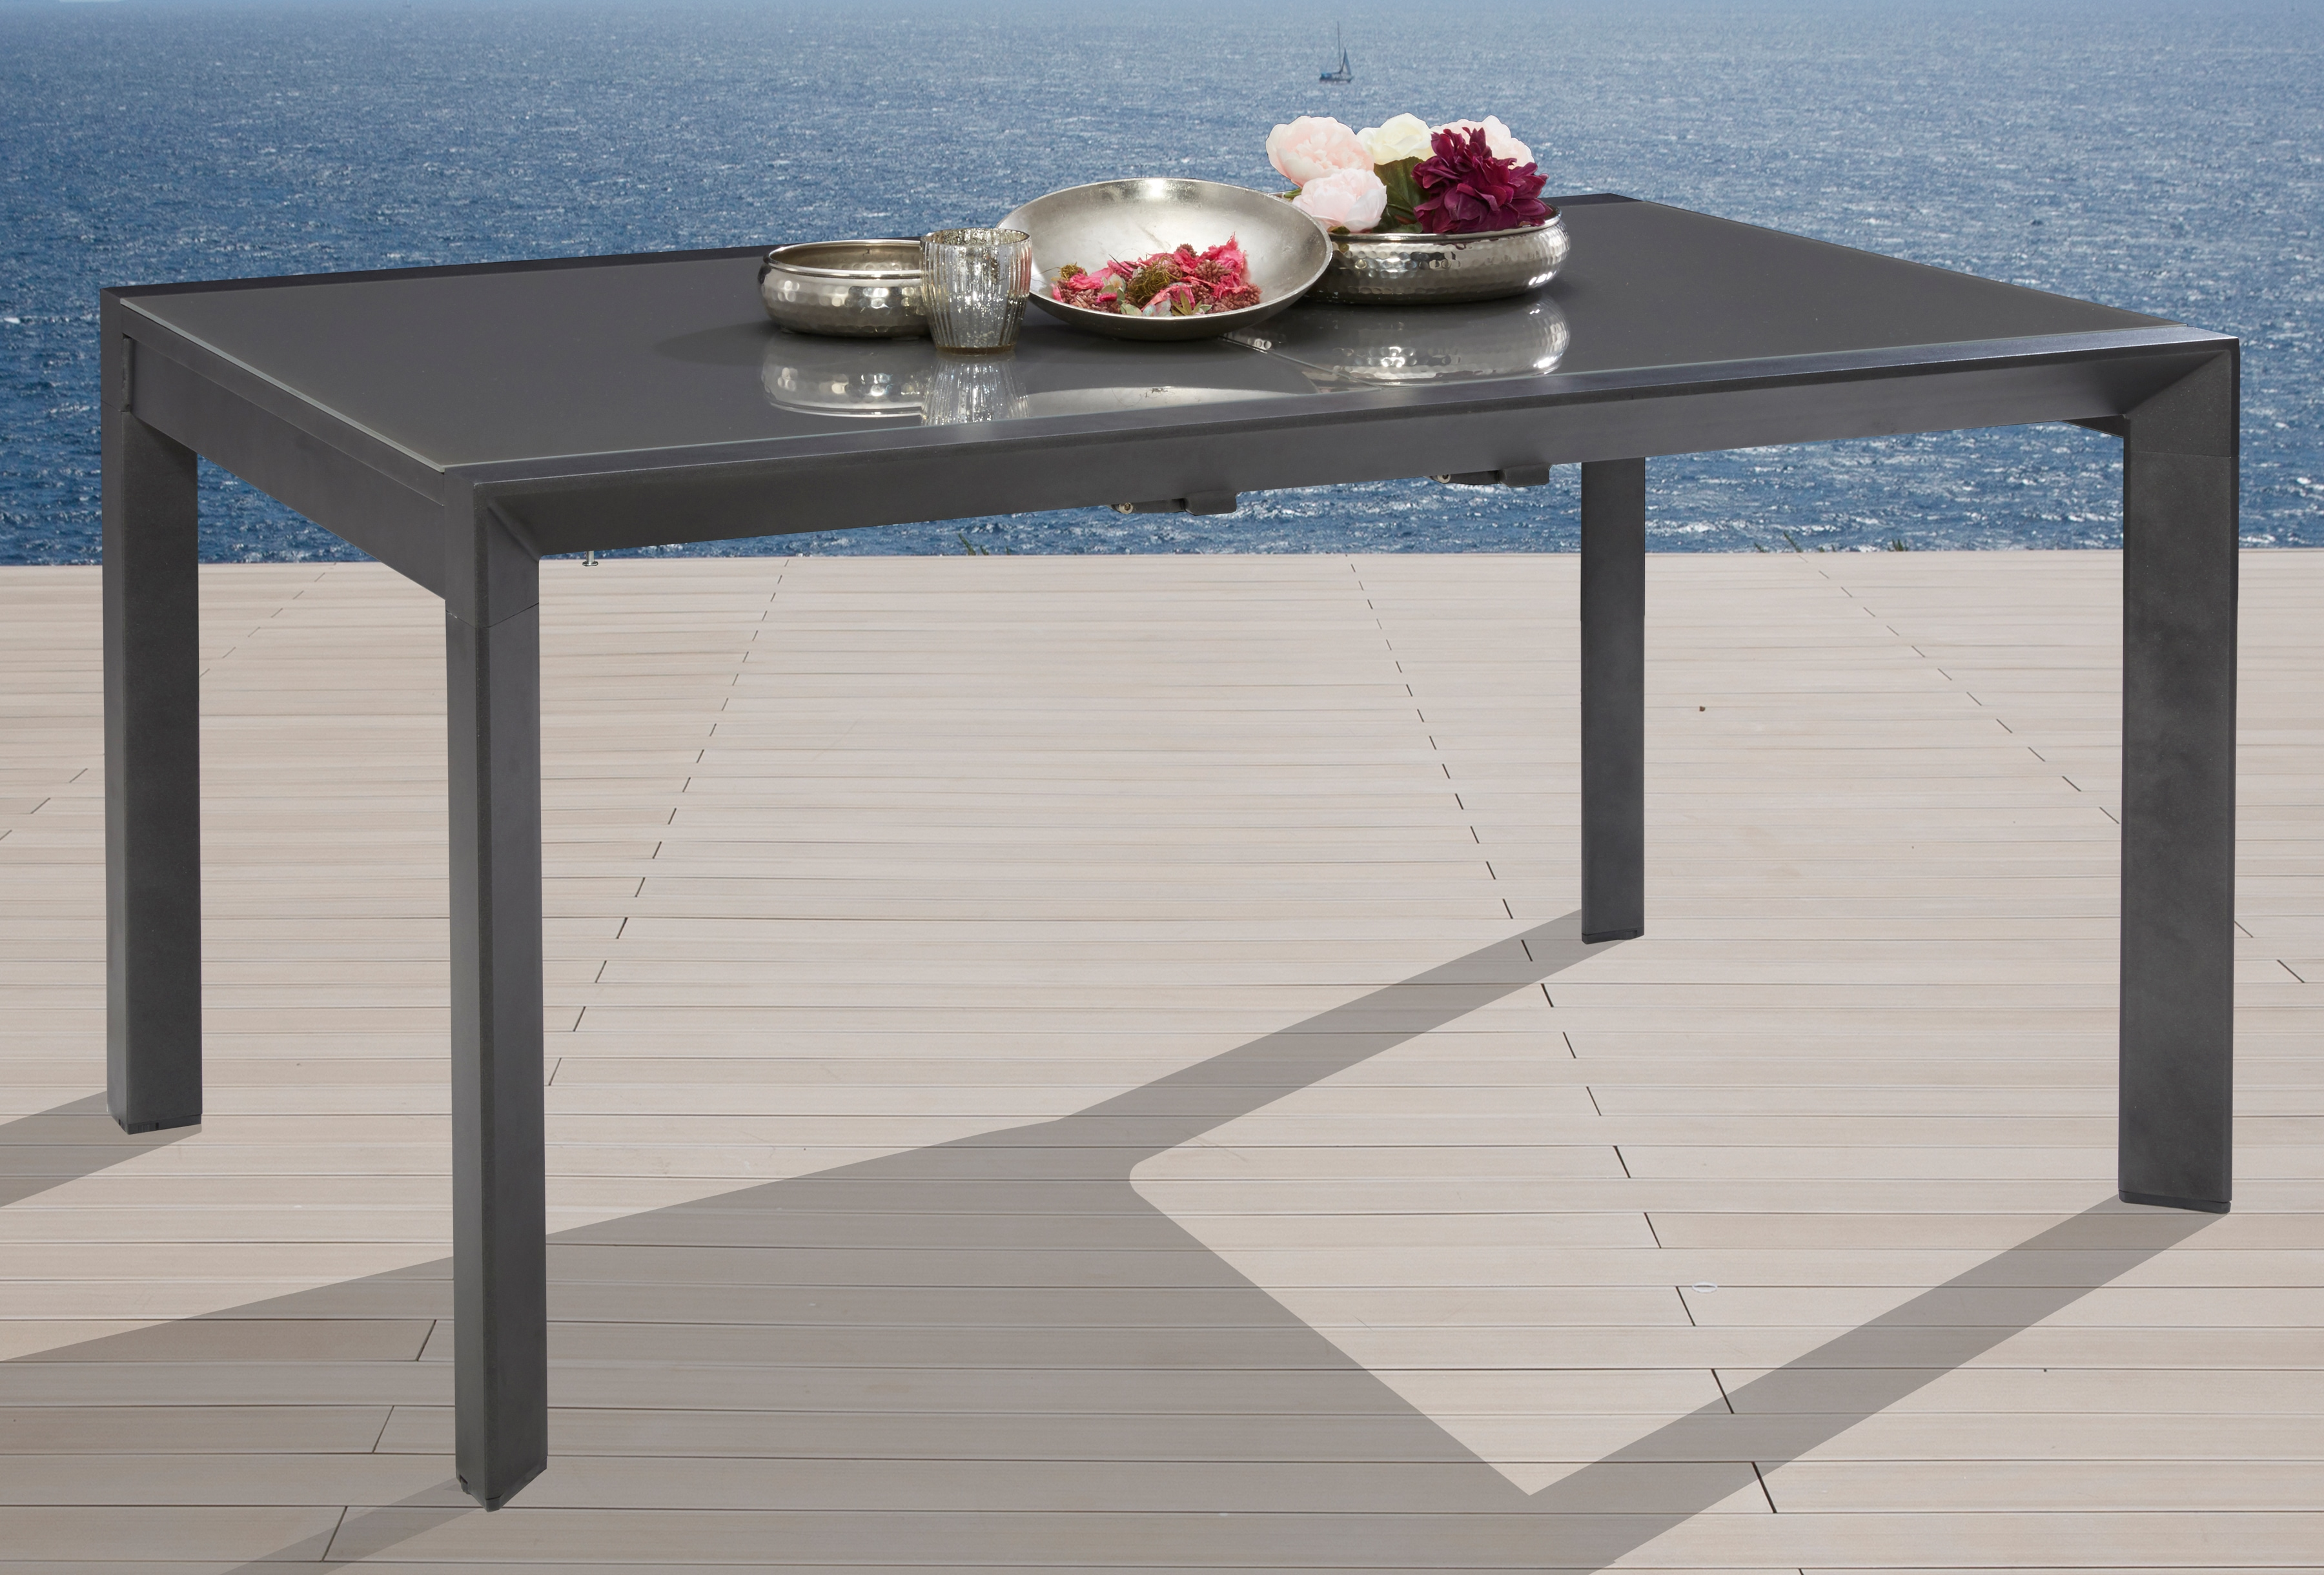 MERXX Gartentisch San Remo Aluminium ausziehbar 160-220x104 cm silber